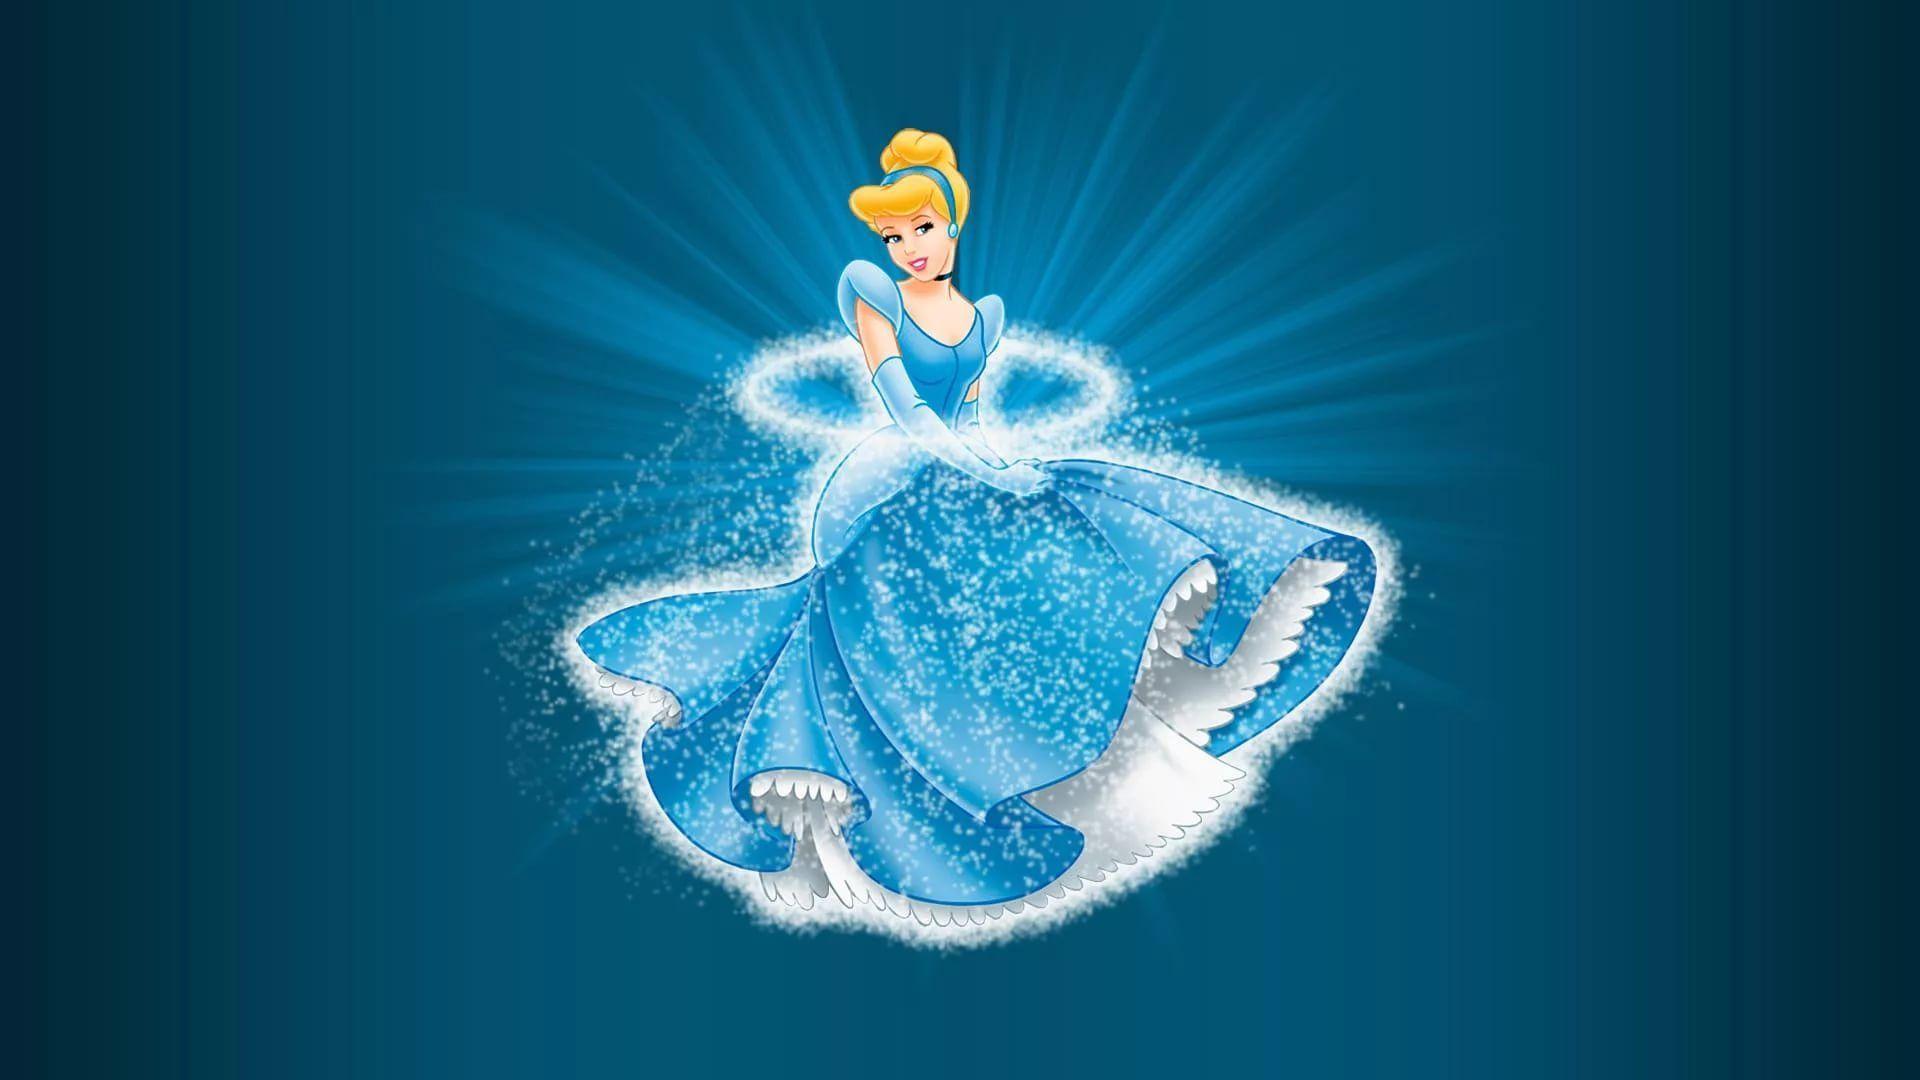 Cinderella Wallpapers Top Free Cinderella Backgrounds Wallpaperaccess